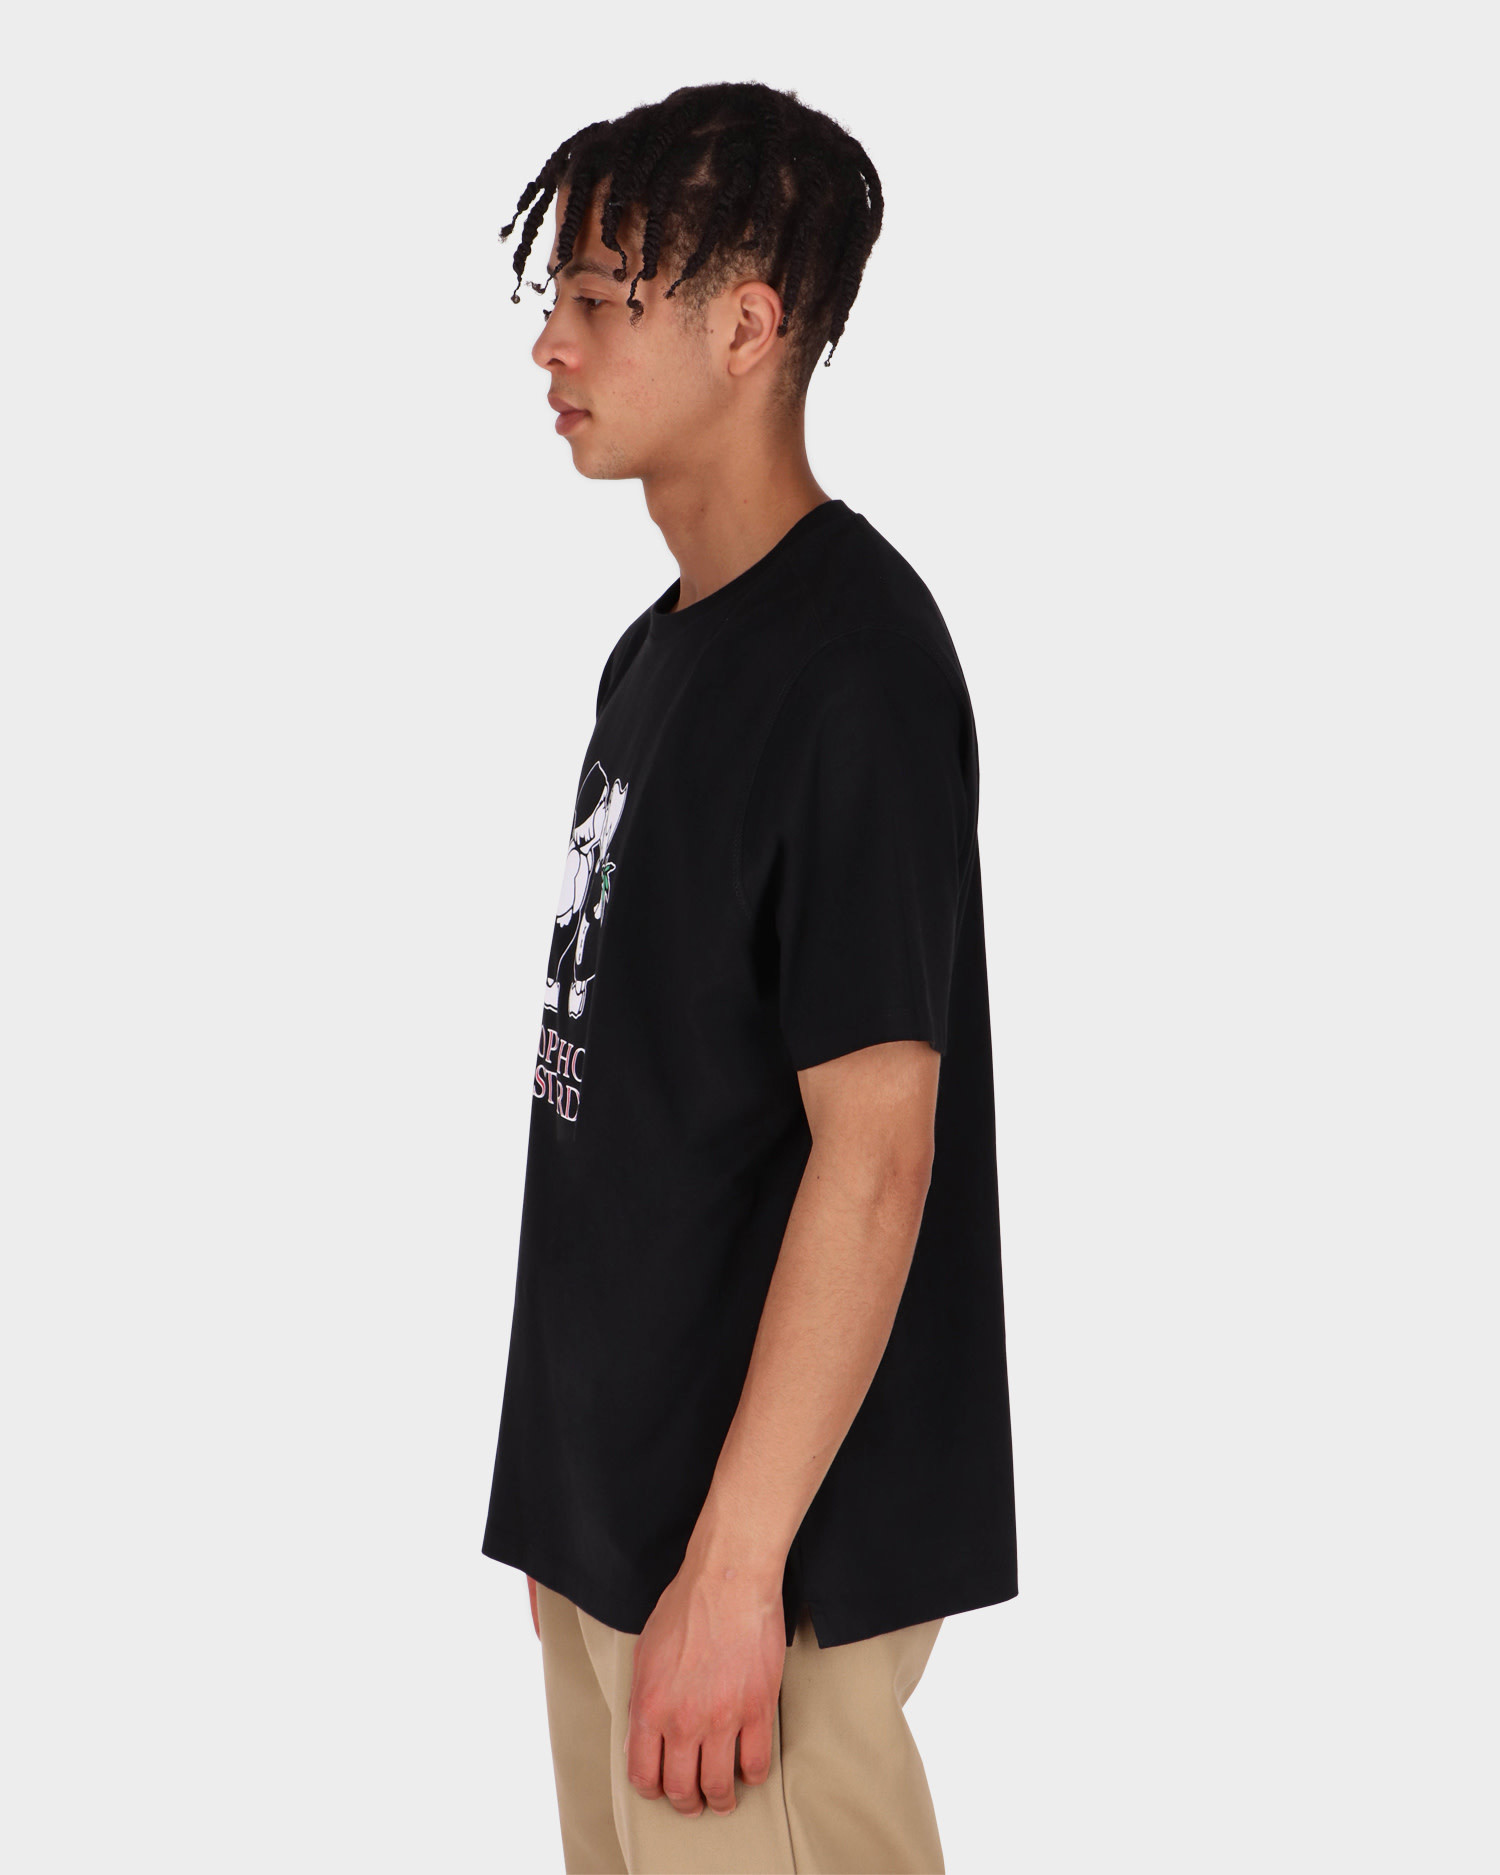 POP Trading Amsterdam T-shirt Black